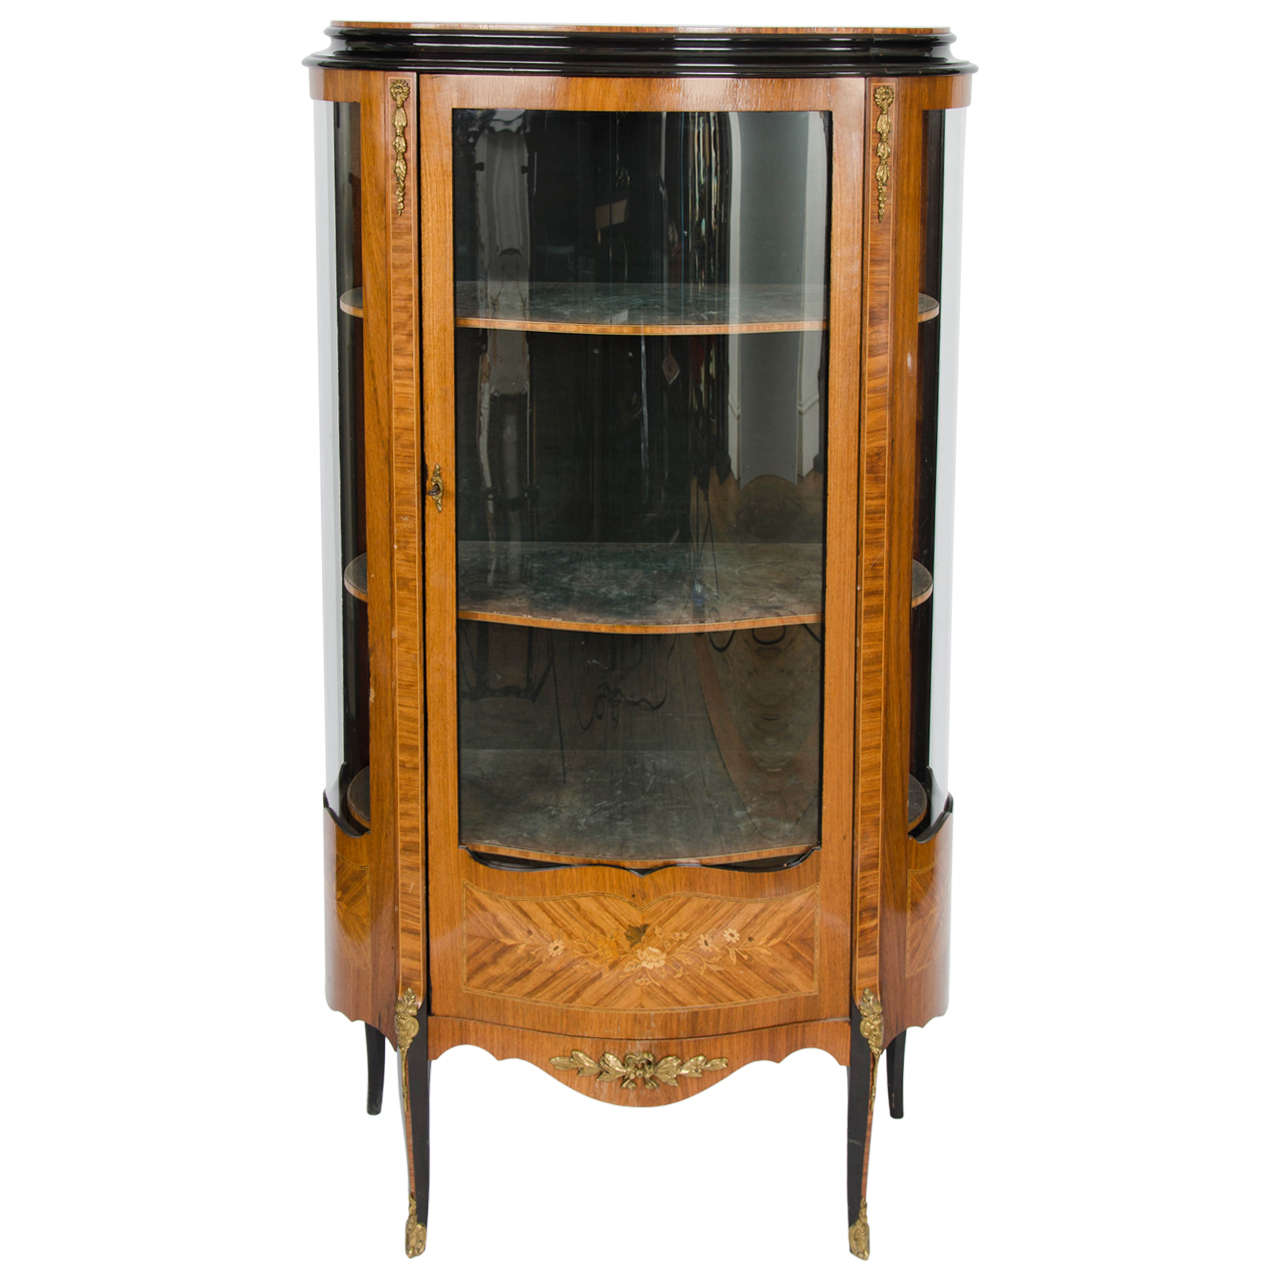 Attractive Vintage French Ormolu Vitrine Glass Display Cabinet At 1stdibs